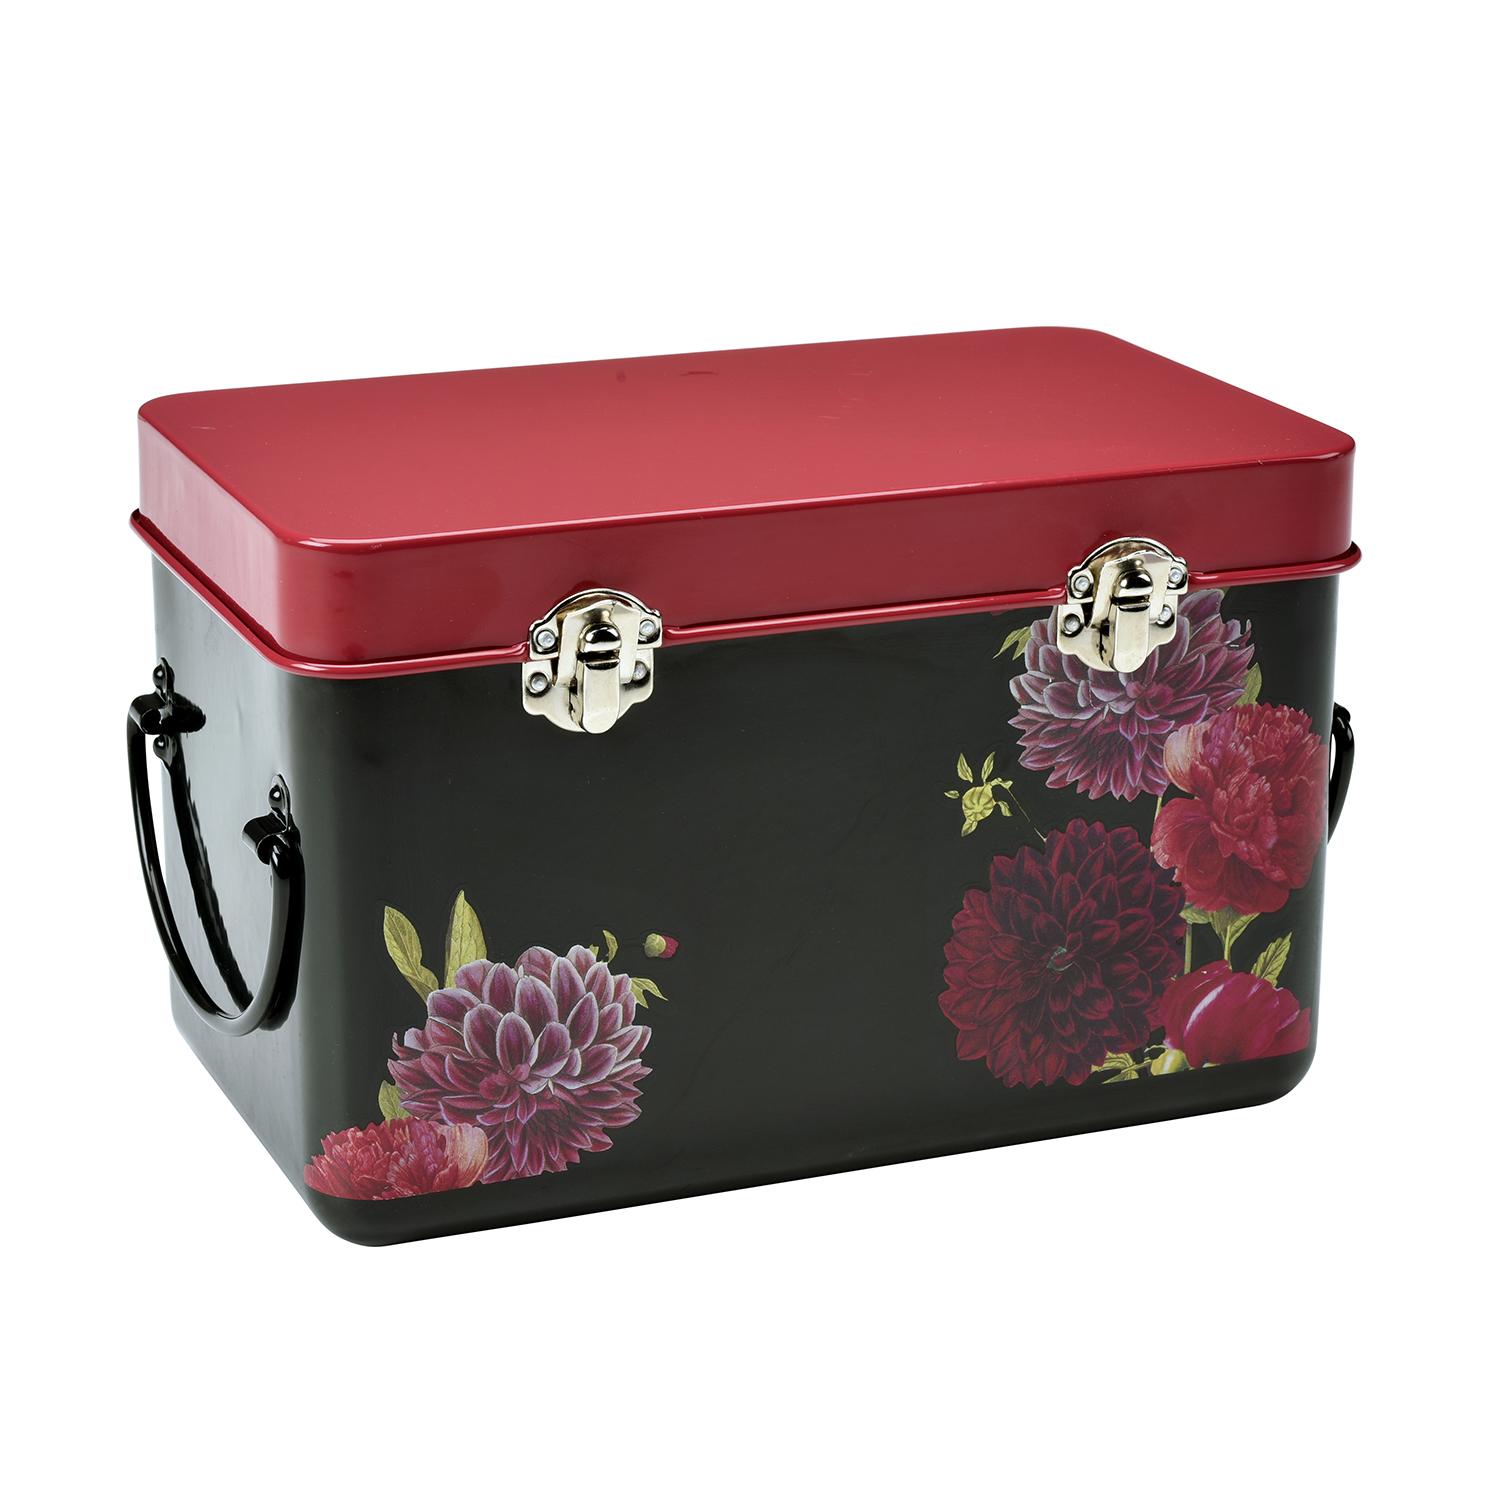 Burgon & Ball – RHS British Bloom Metal Handled Seed Packet Storage Tin